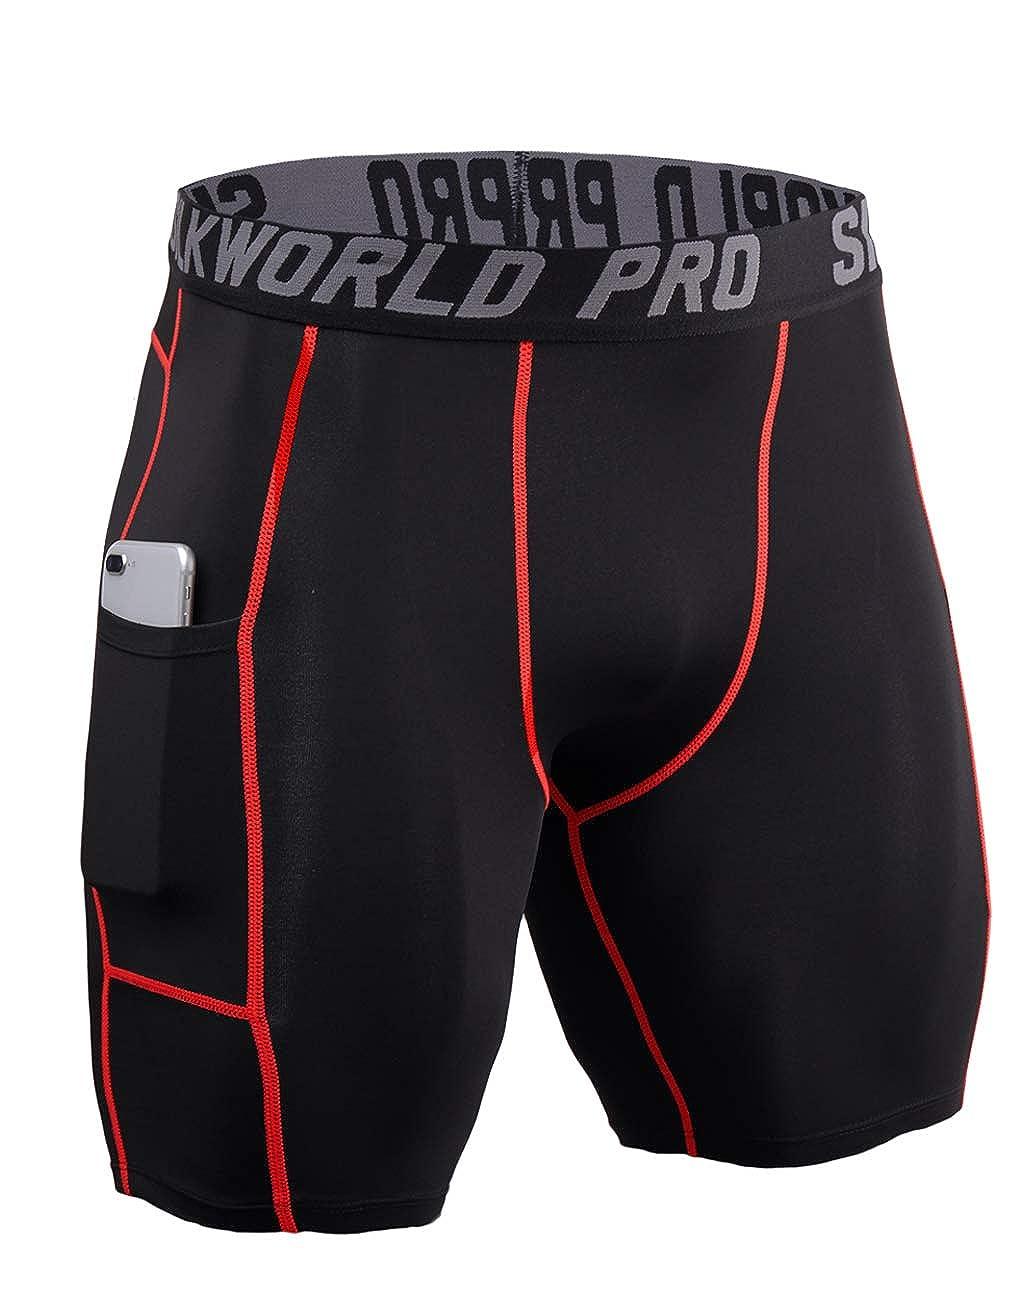 SILKWORLD UNDERWEAR メンズ Large / Waist: 33.5\ 0788-pockets: Black(red Stripe) B07QRQXH1H